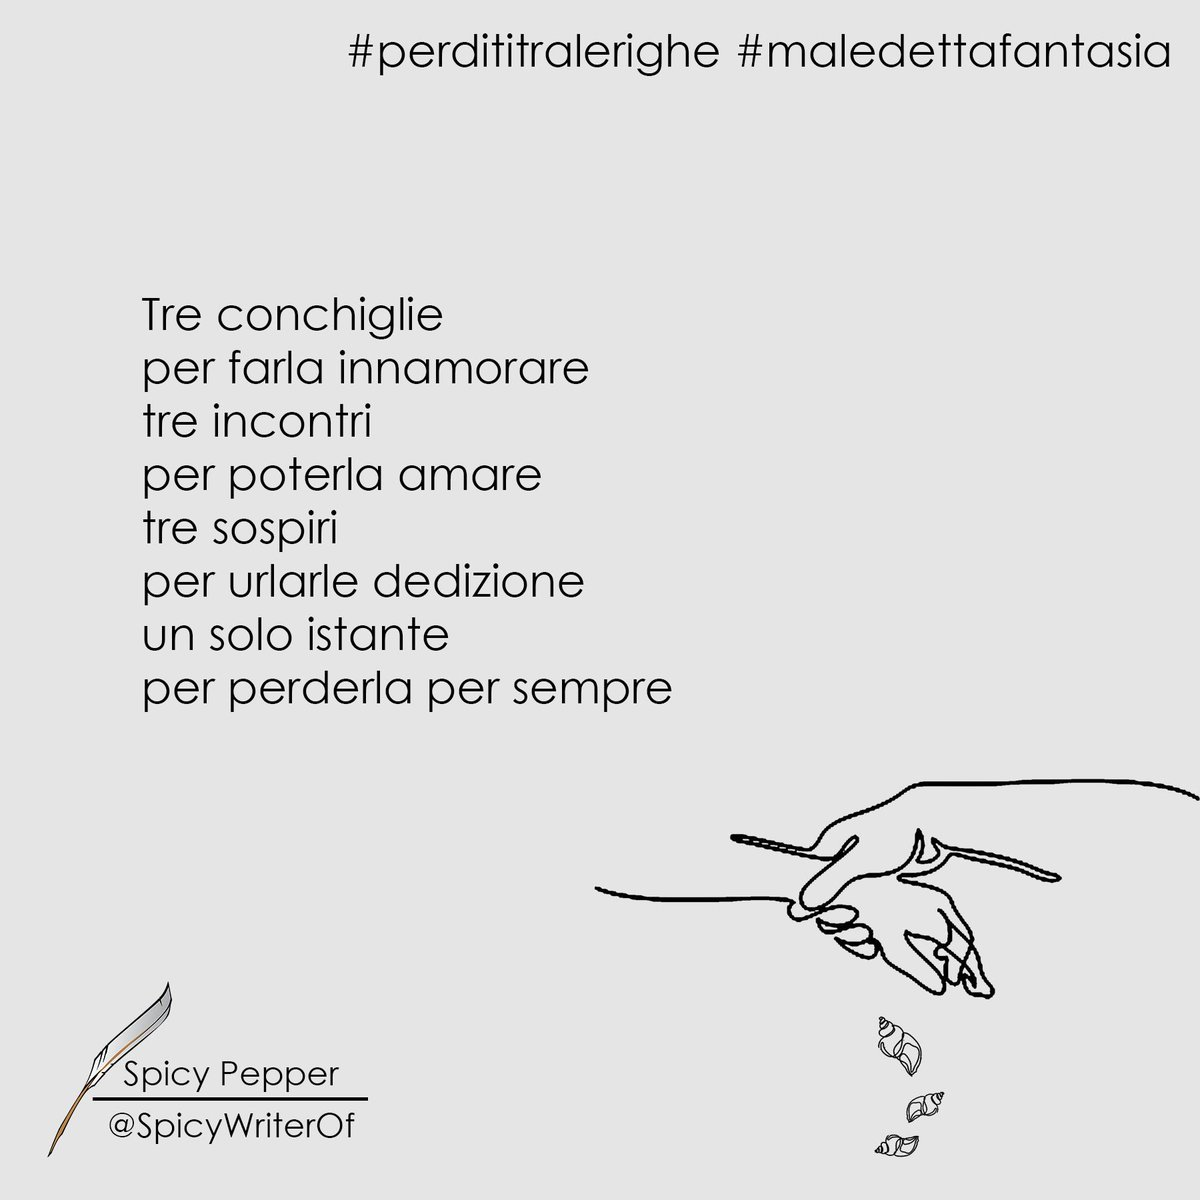 Italiano Italiano incontri frasi